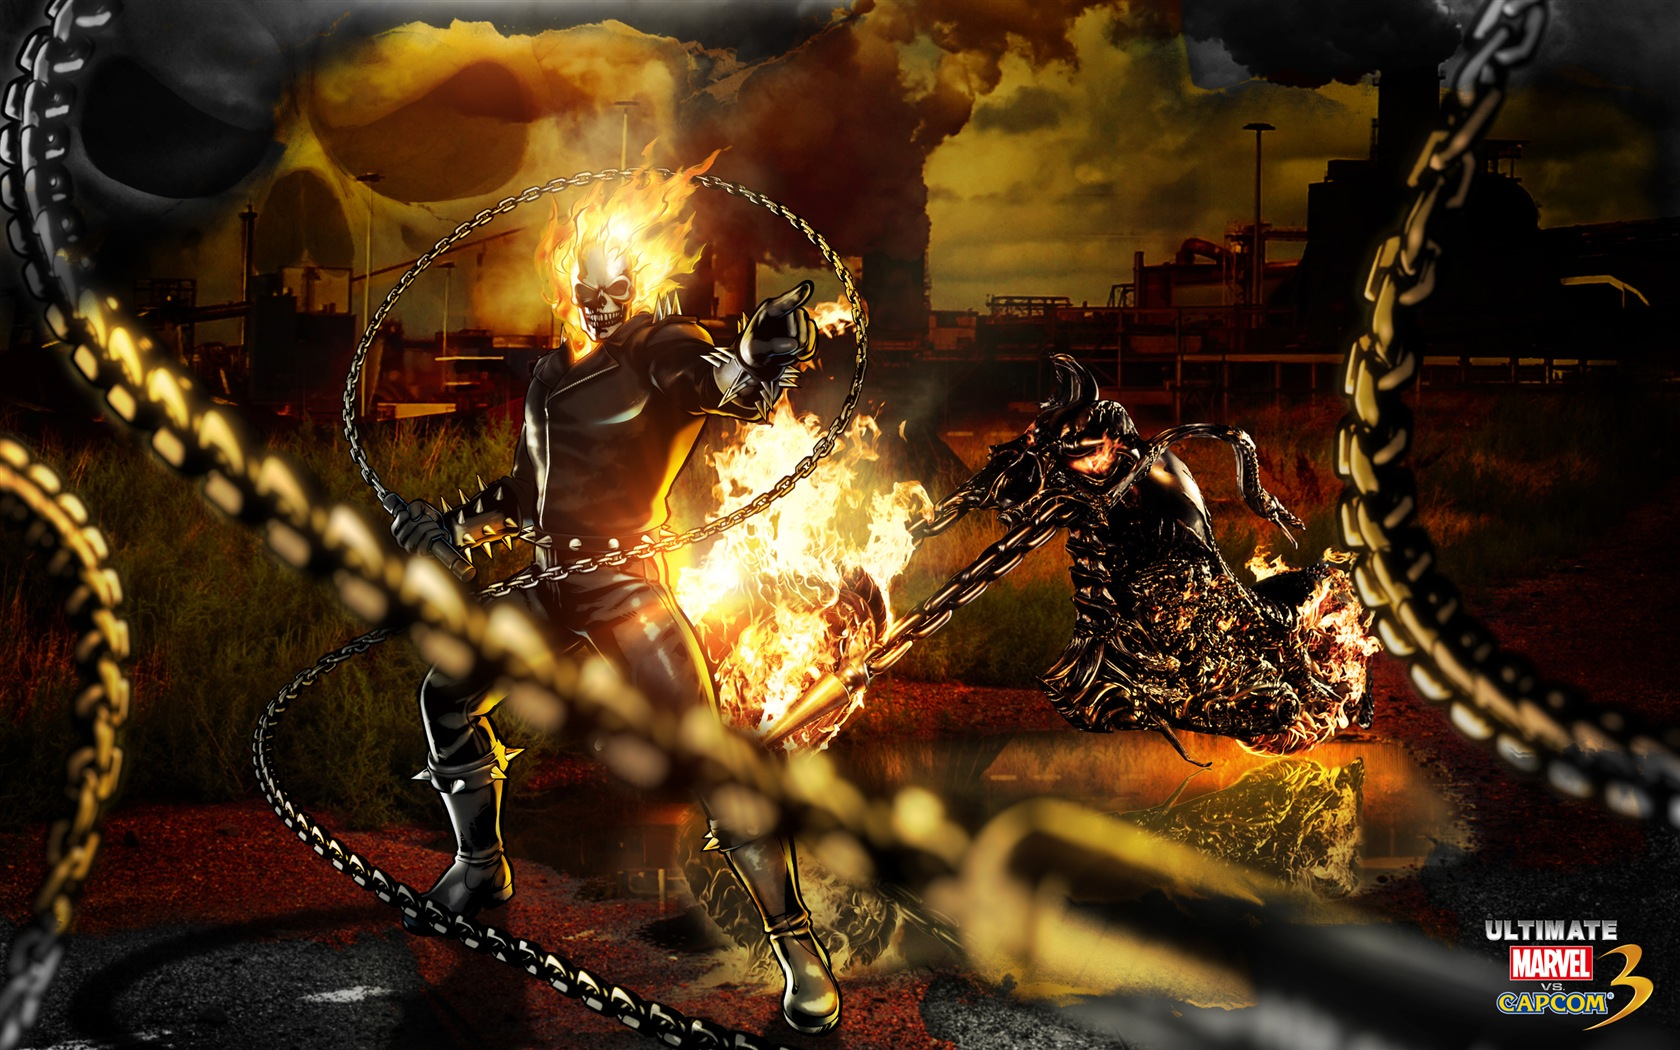 ghost rider ultimate marvel vs capcom 3 wallpaper